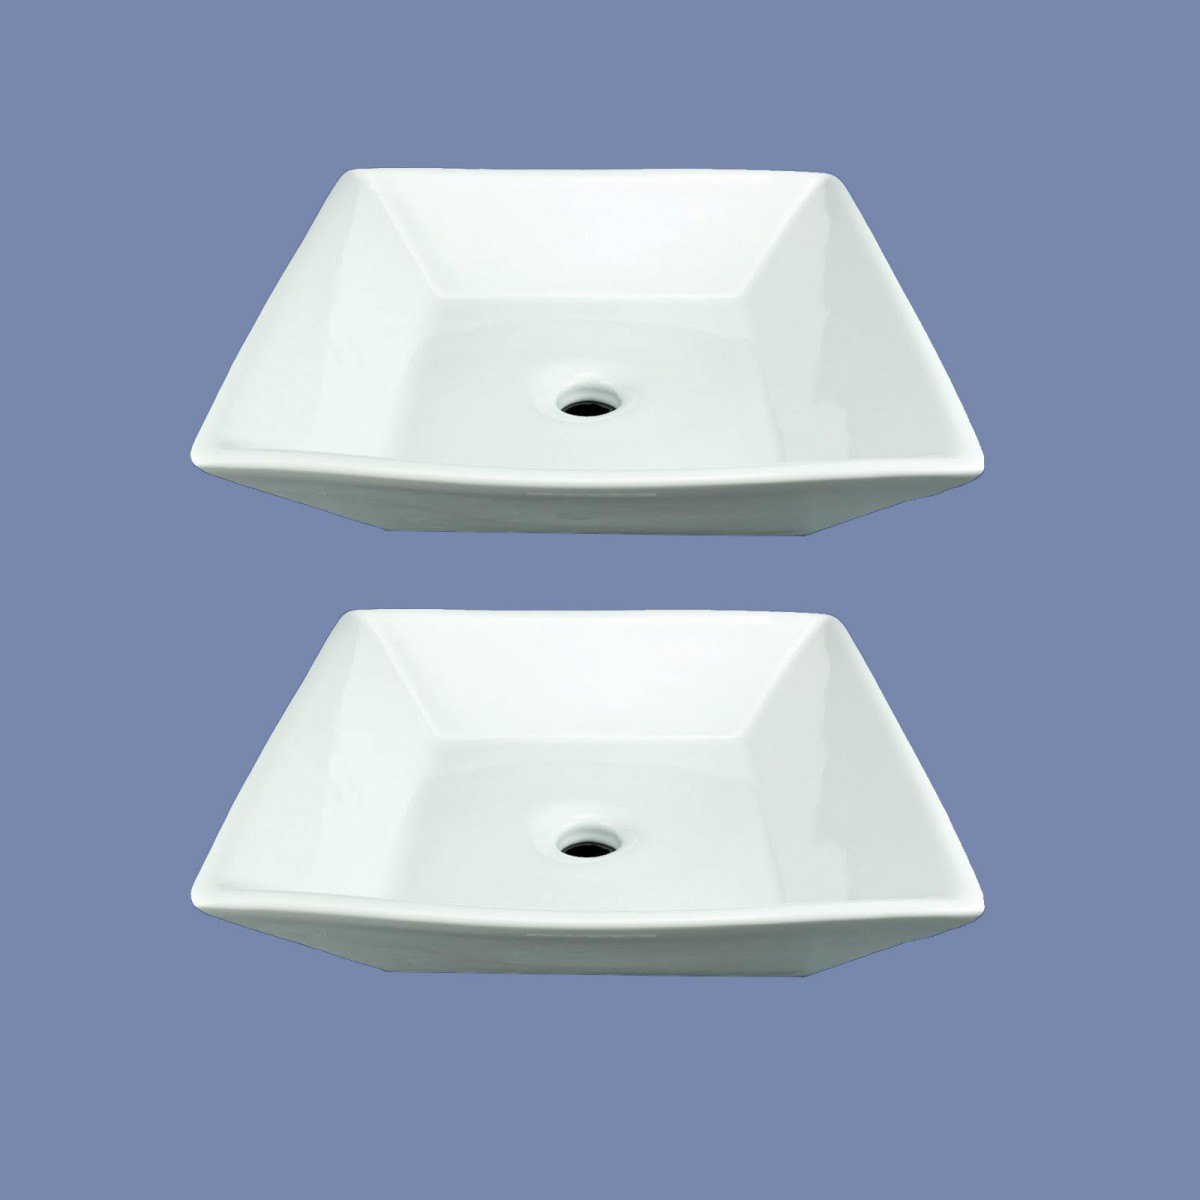 Bathroom Vessel Sinks Square White No Overflow Set of 2